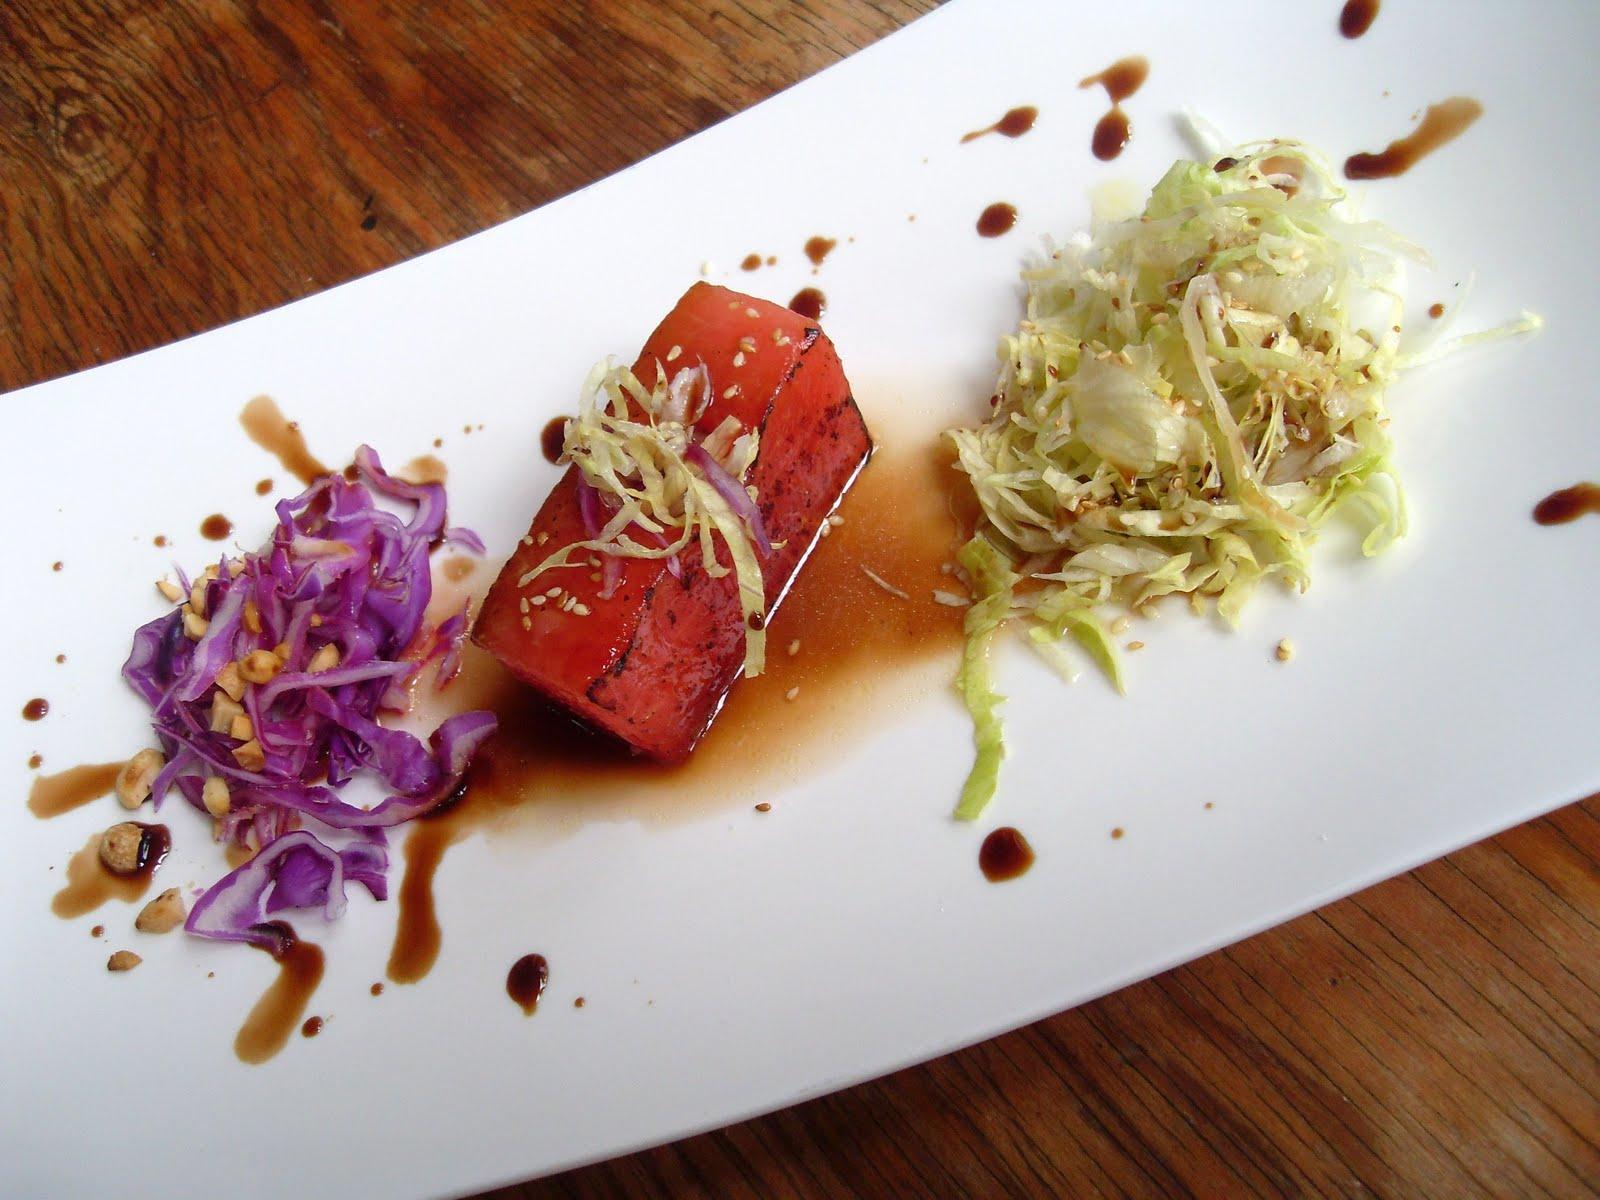 Colegio thotal gourmet diplomado en cocina para for Utillaje cocina